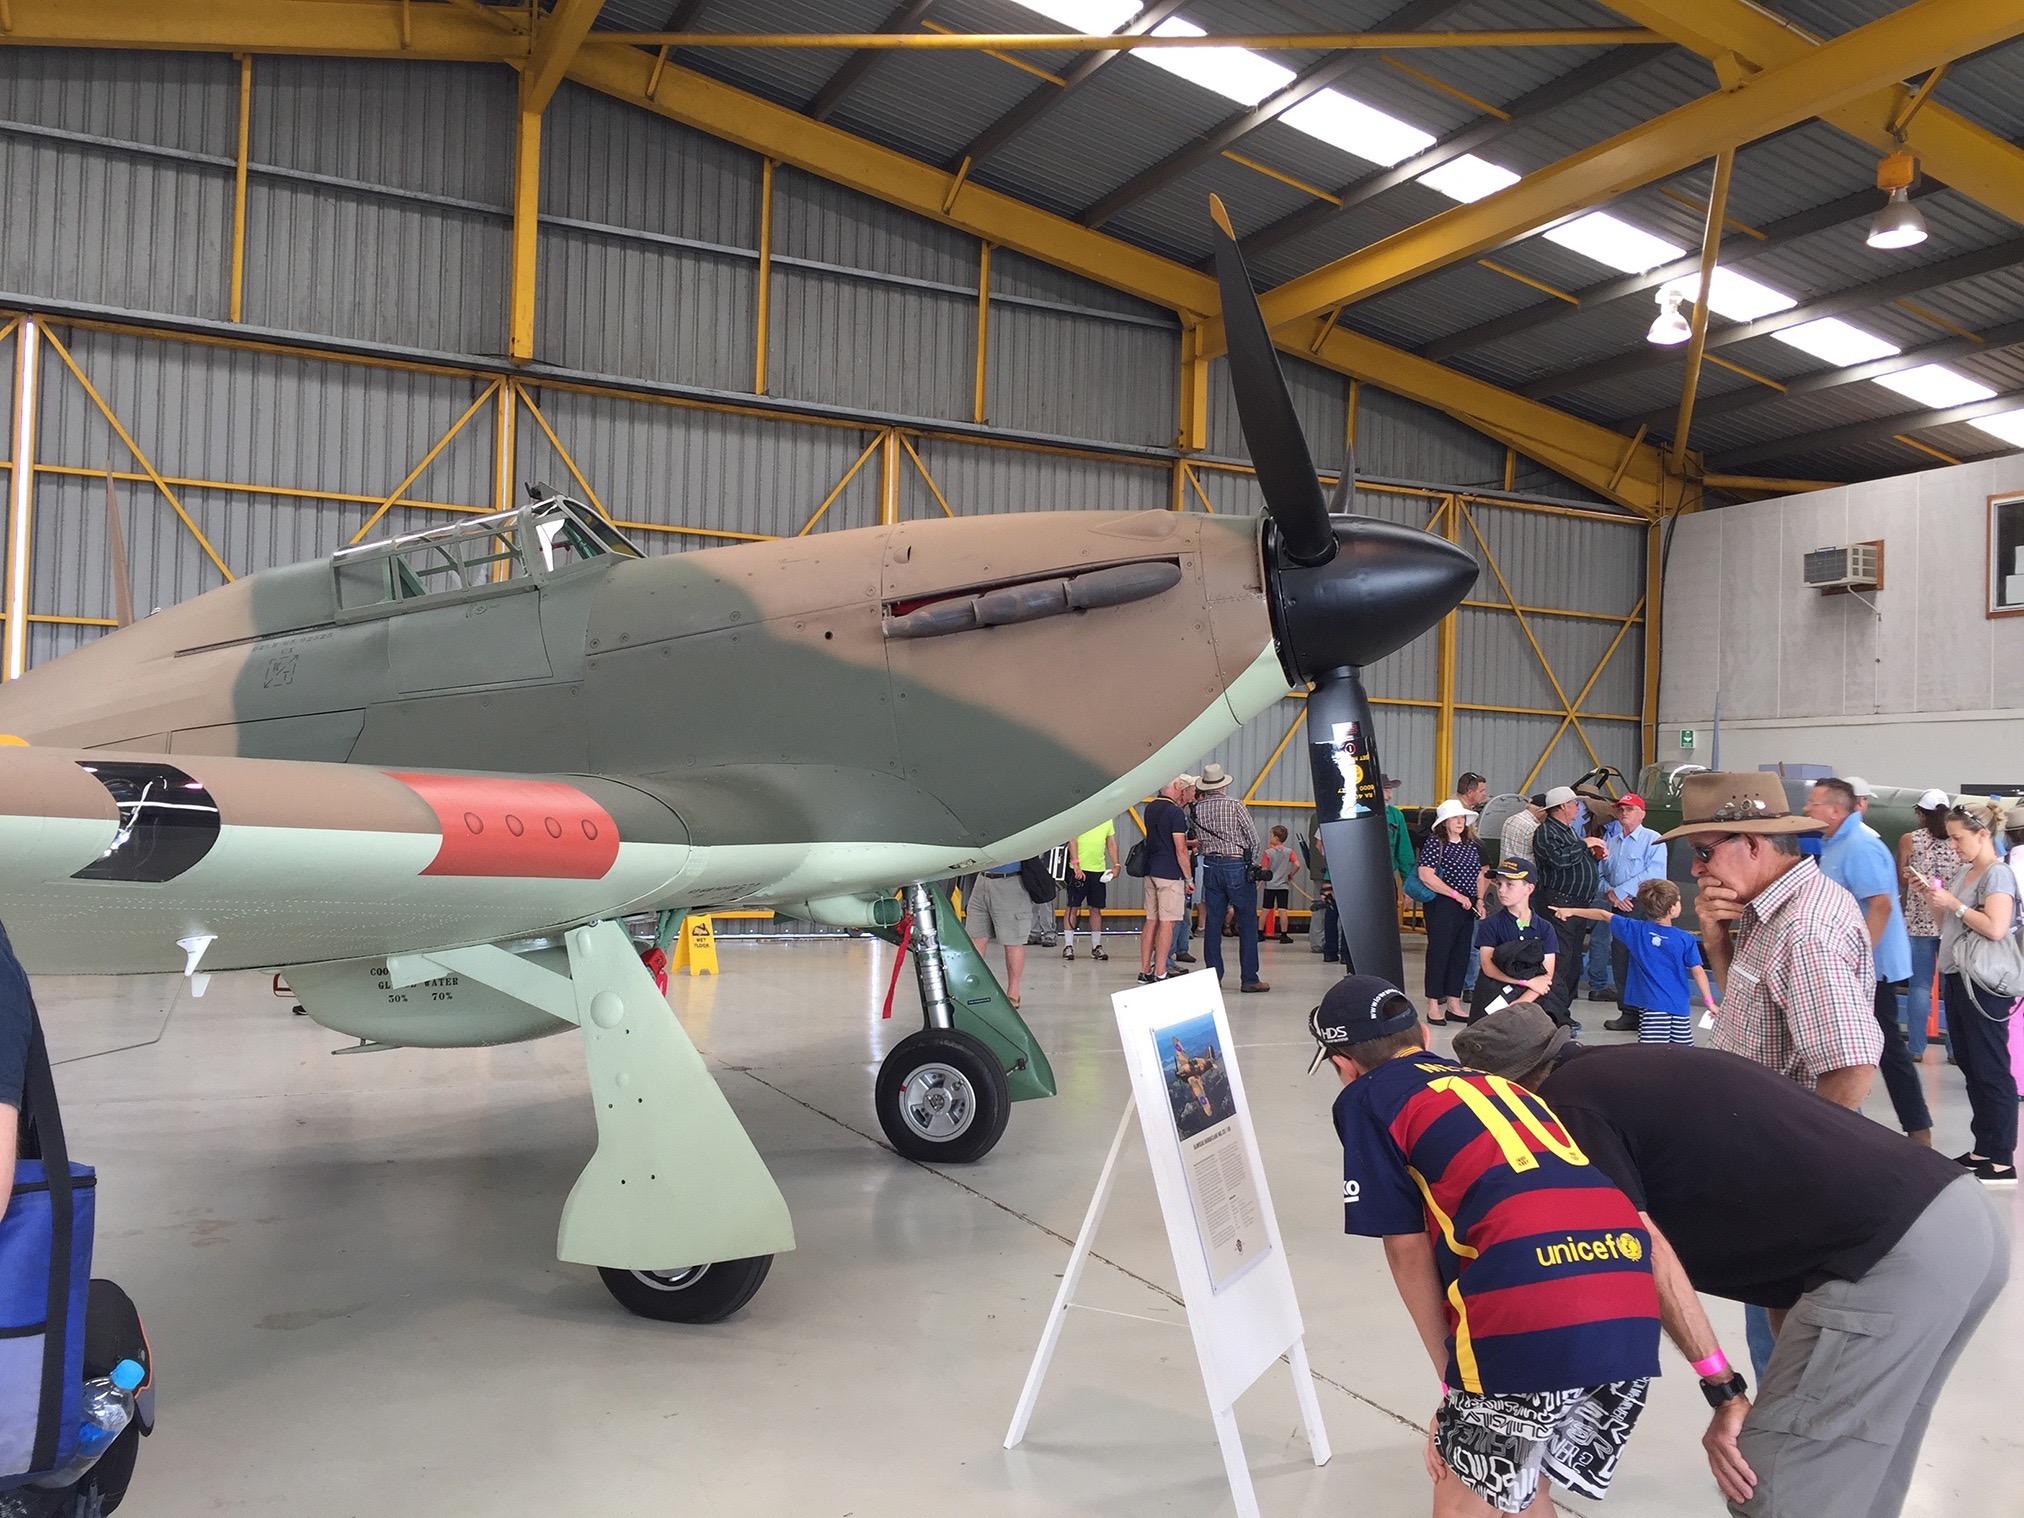 Flight of the Hurricane hangar display